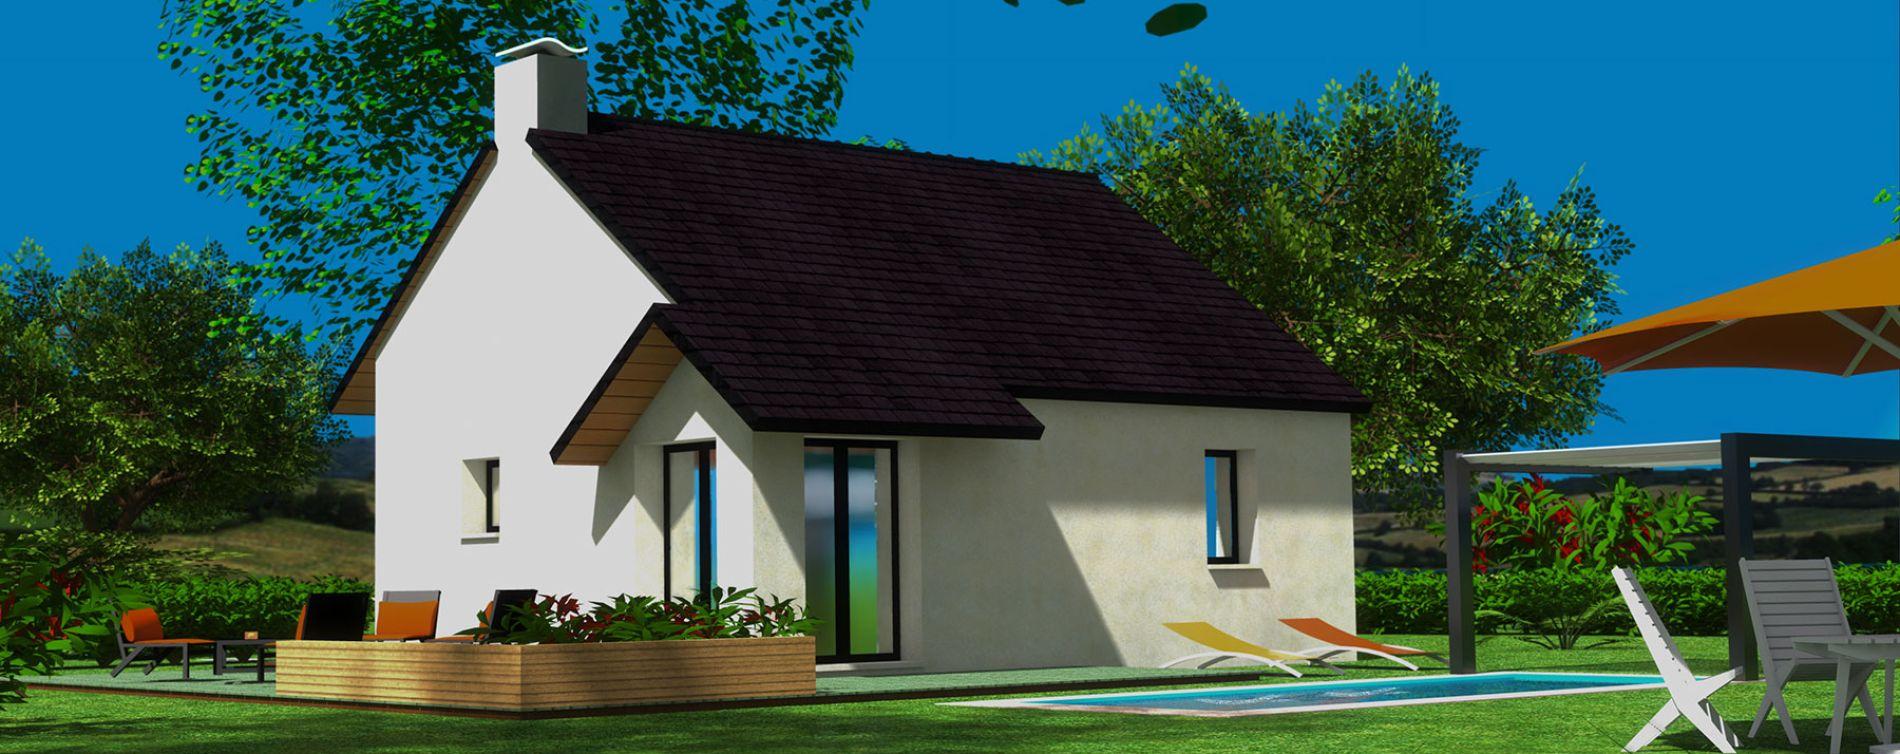 Lesneven : programme immobilier neuve « Pen Ar C'Hoat » (3)